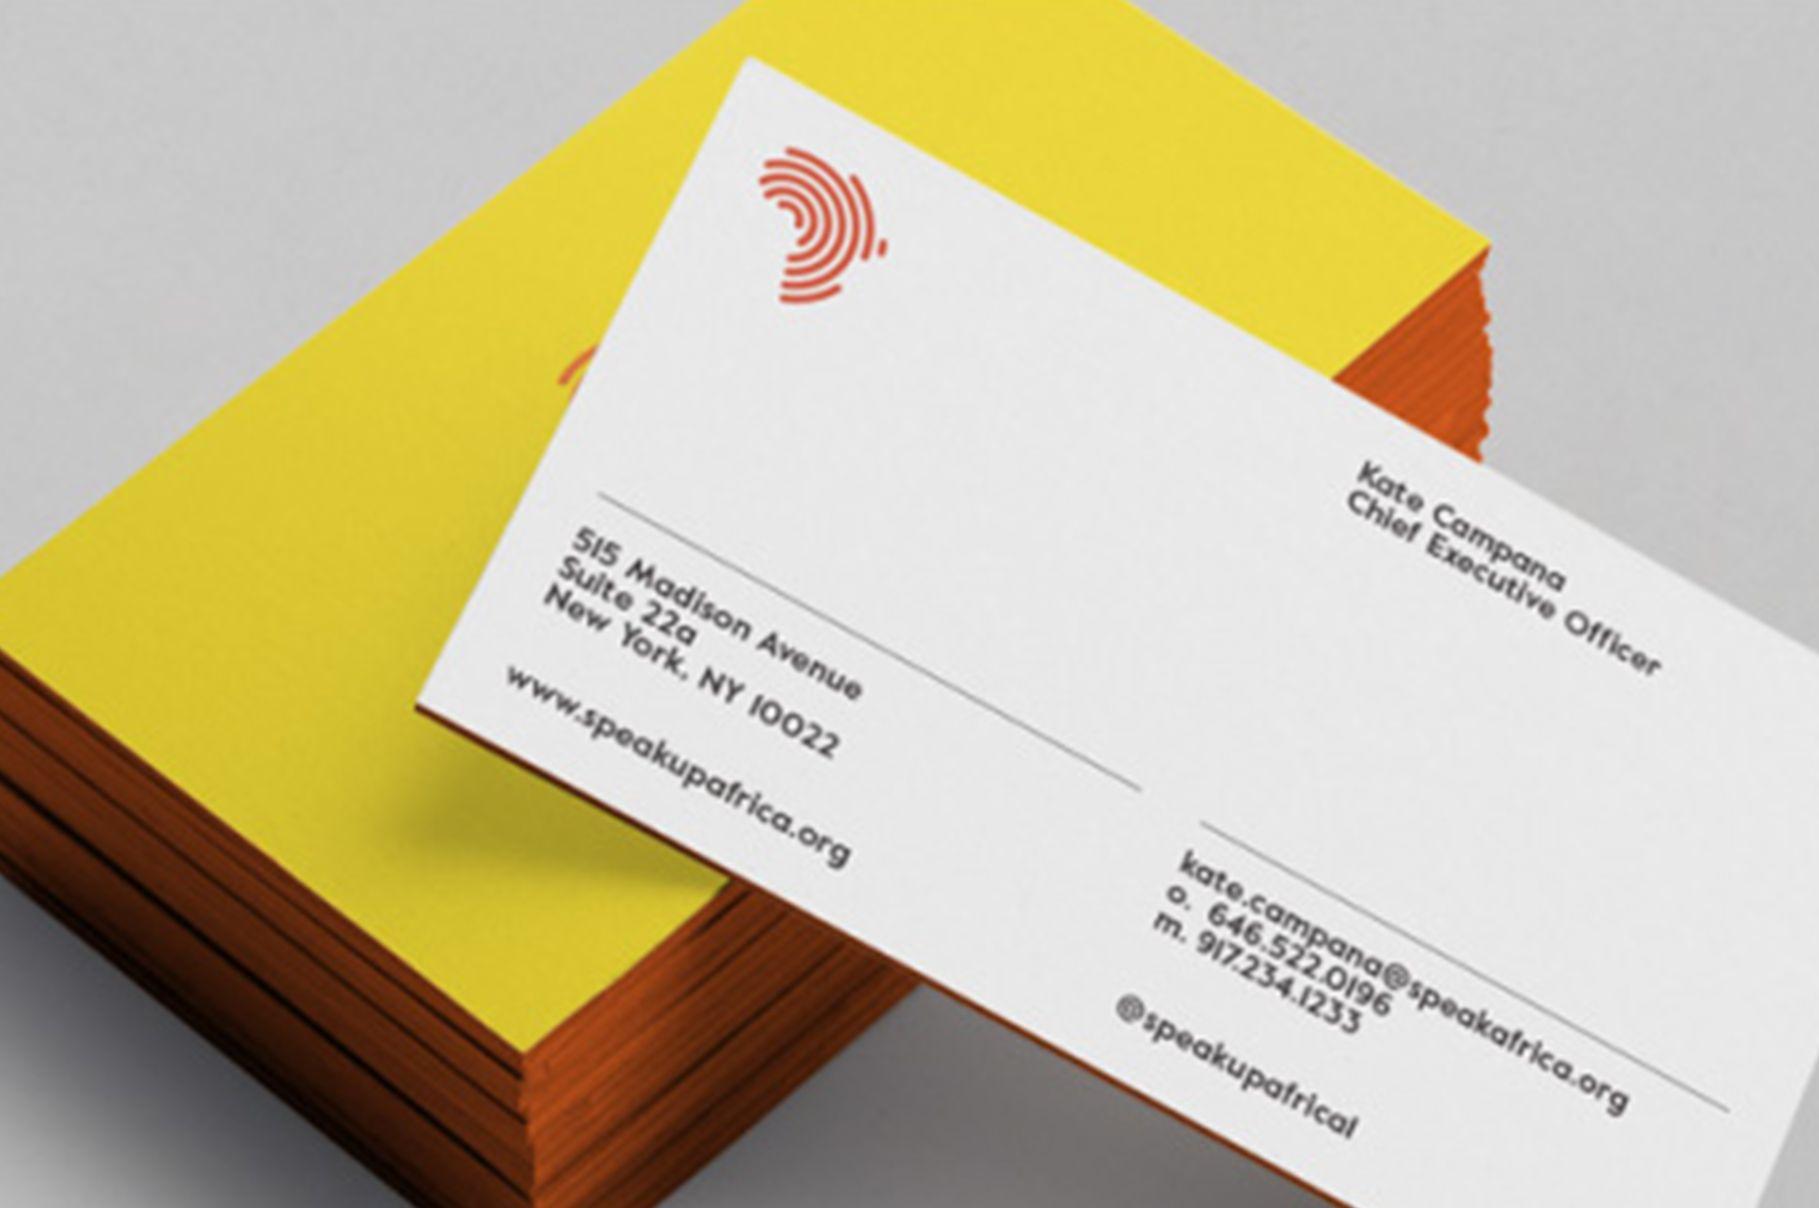 Inspiringbrands speak up africa inspiringbrands pinterest speak up africa edge painted business cards designed by dia colourmoves Choice Image